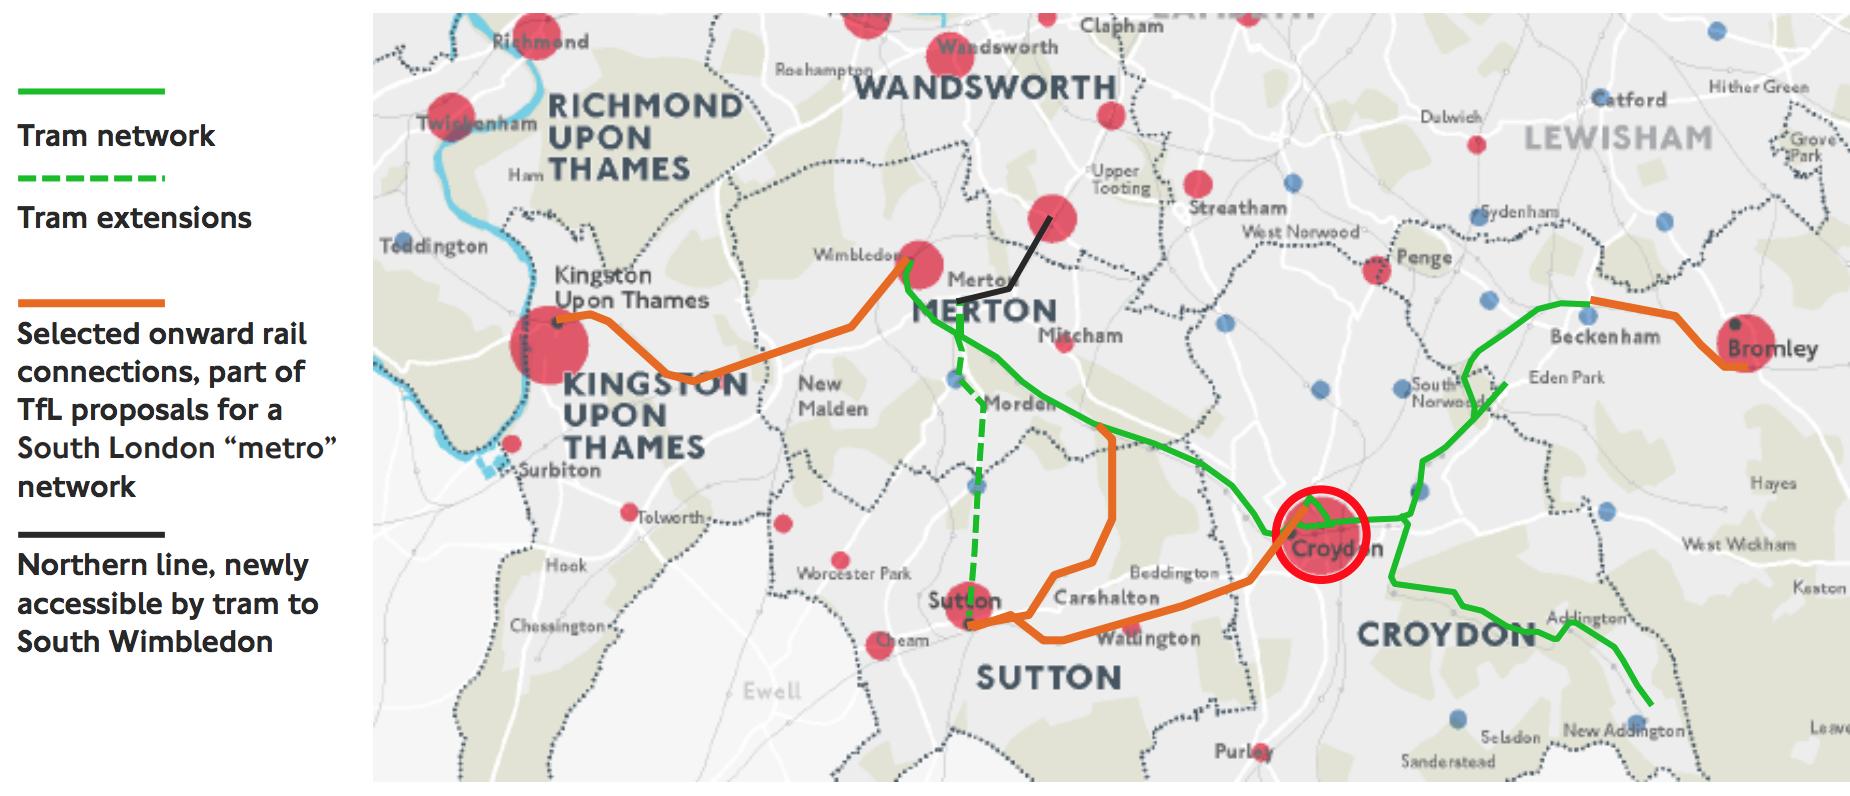 Merton and Sutton Borough Council foot the 230m South Wimbledon